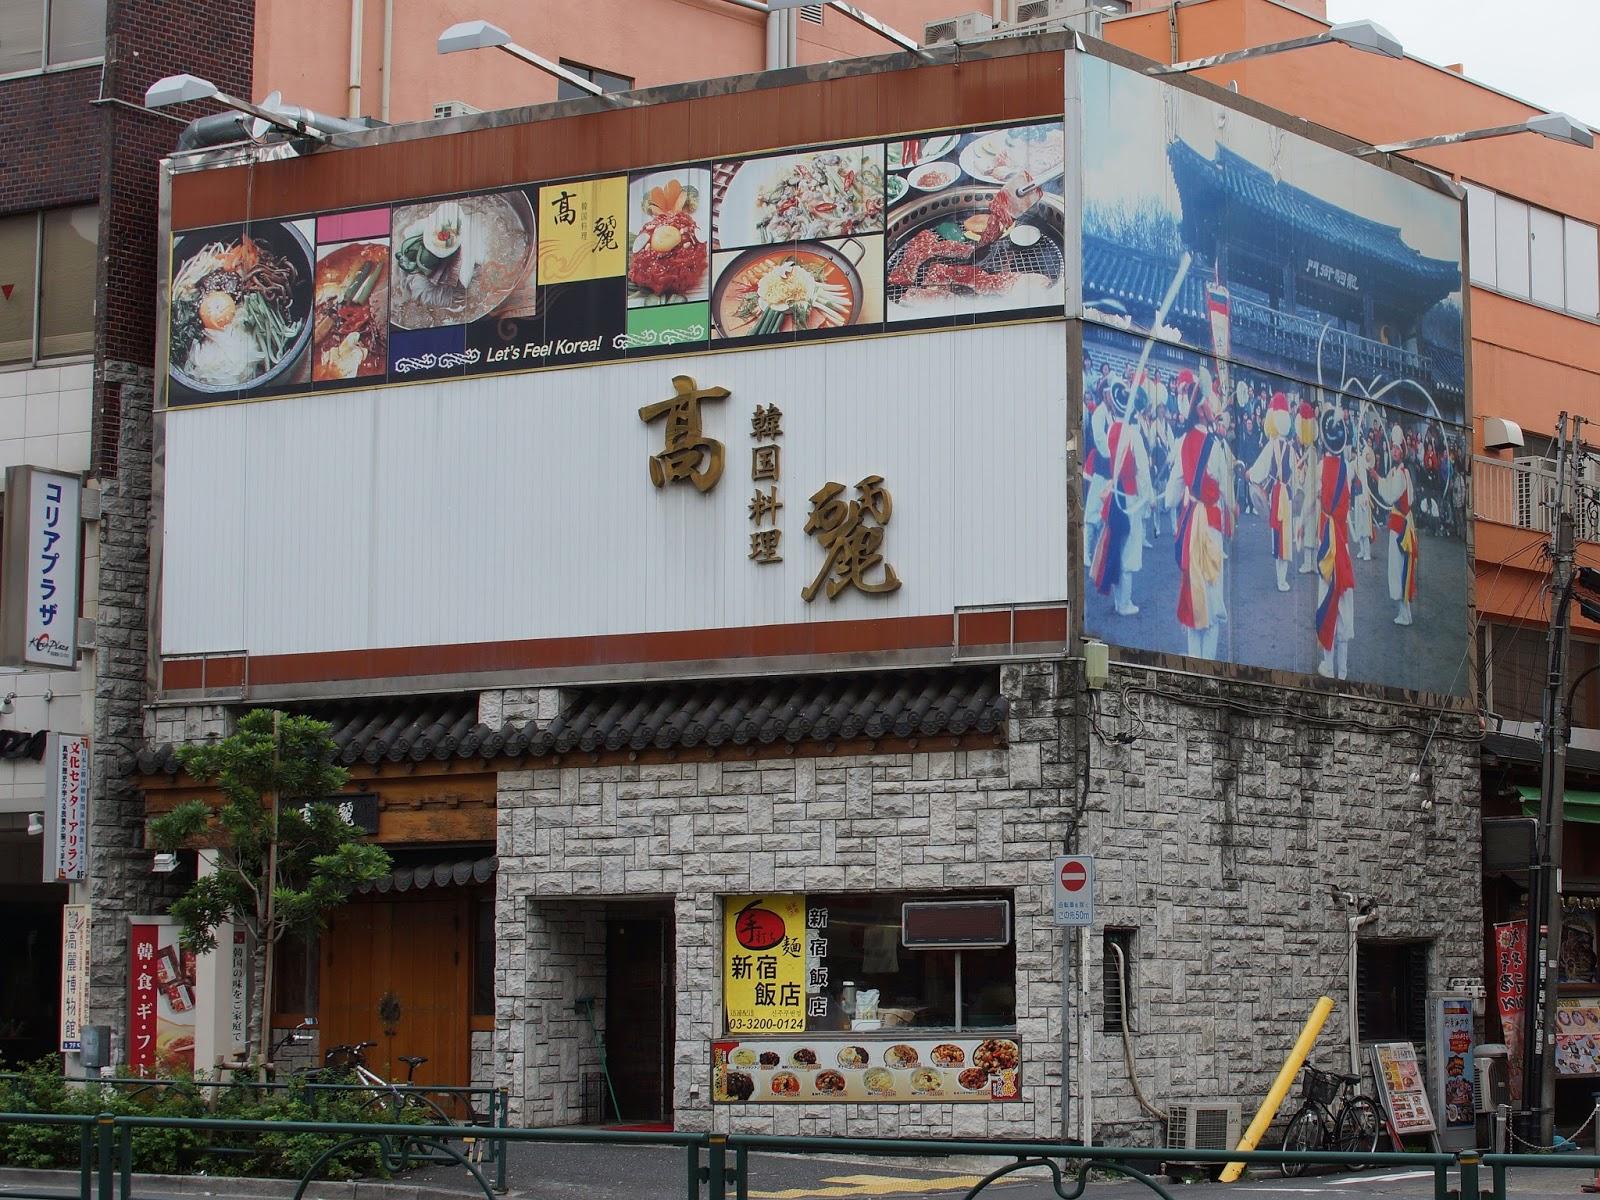 tokyo life 東京日記 korean town in tokyo okubo area 東京大久保地区